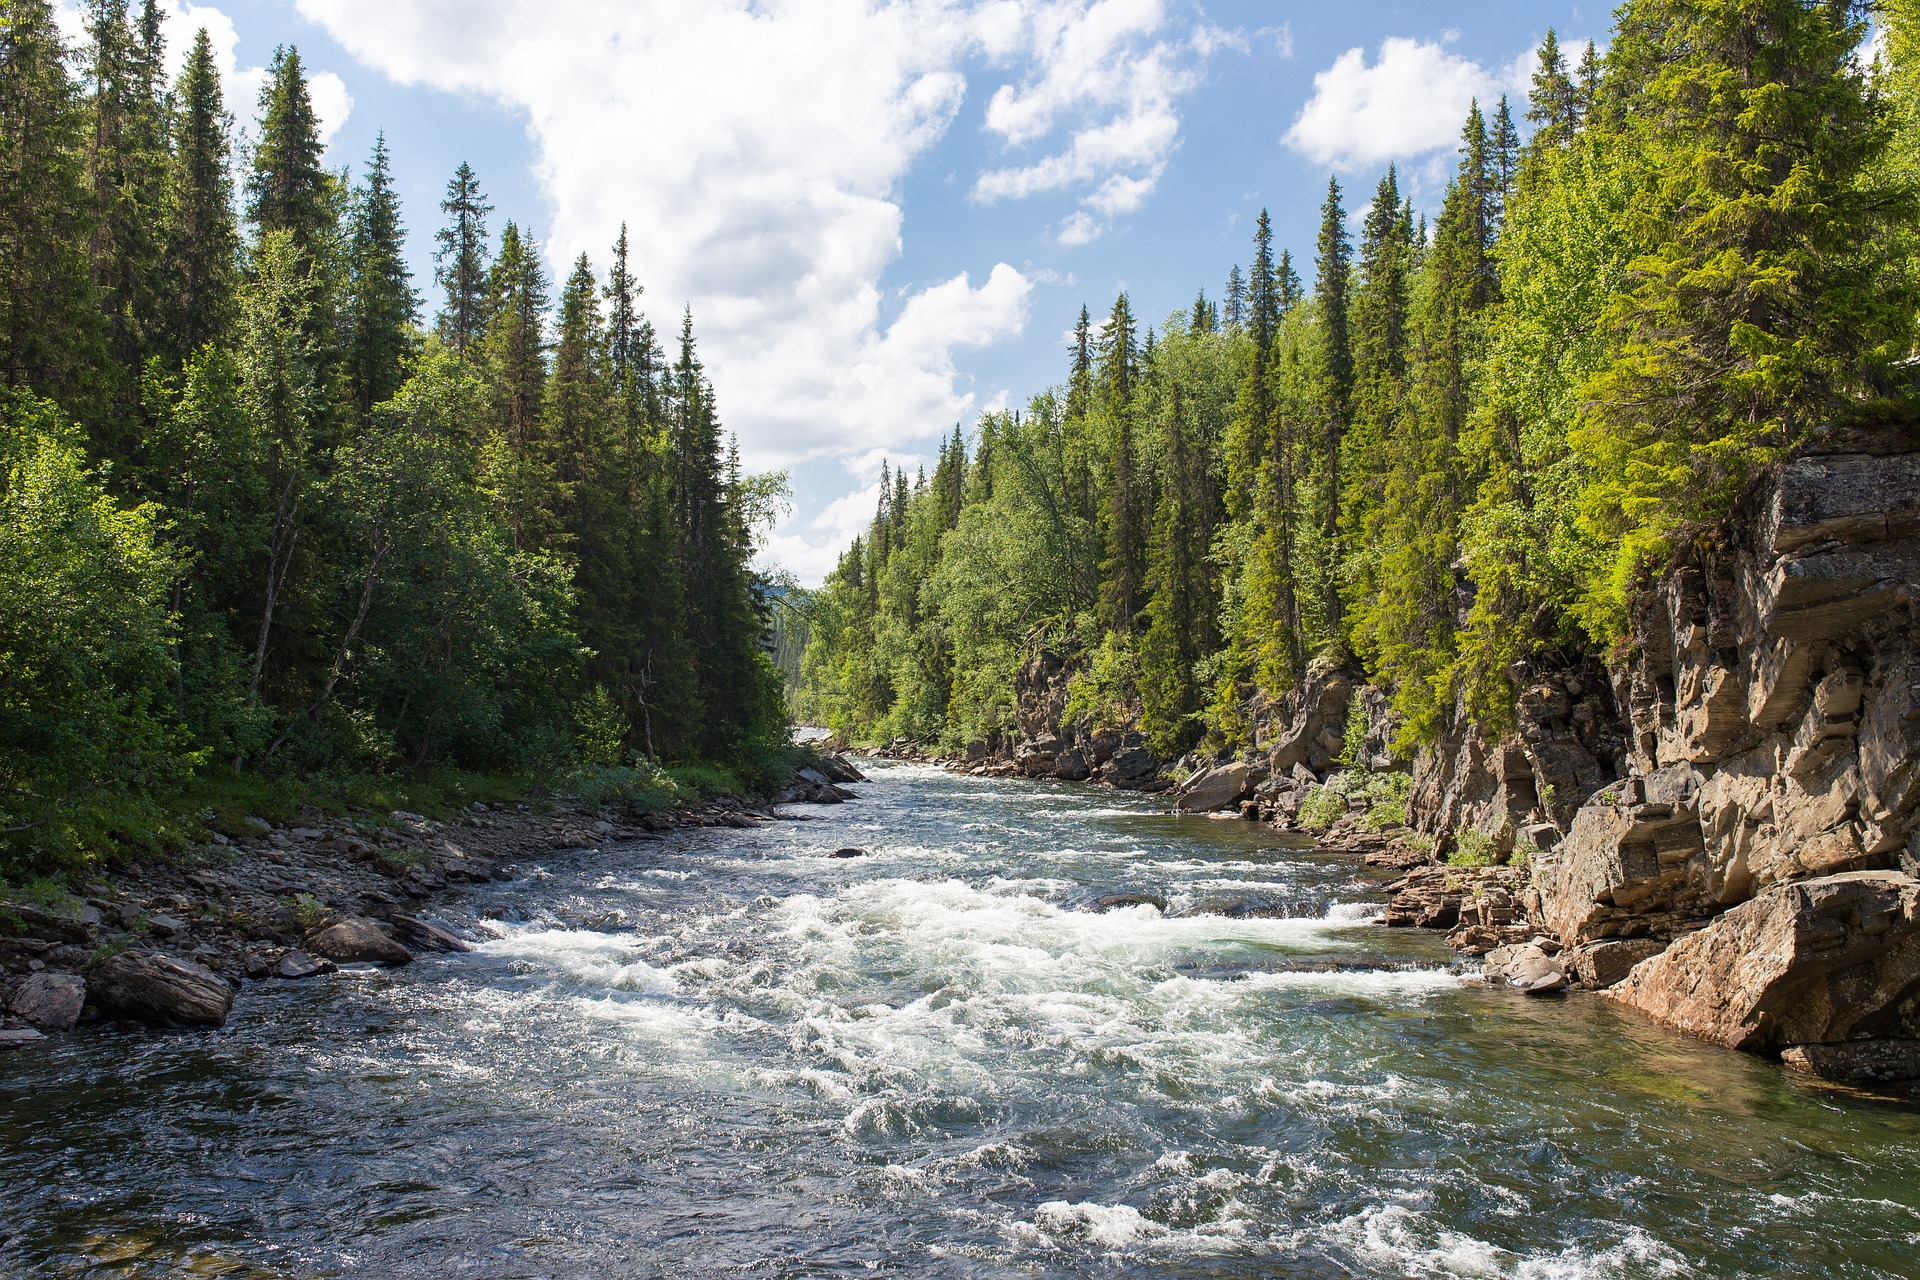 river-1209025_1920